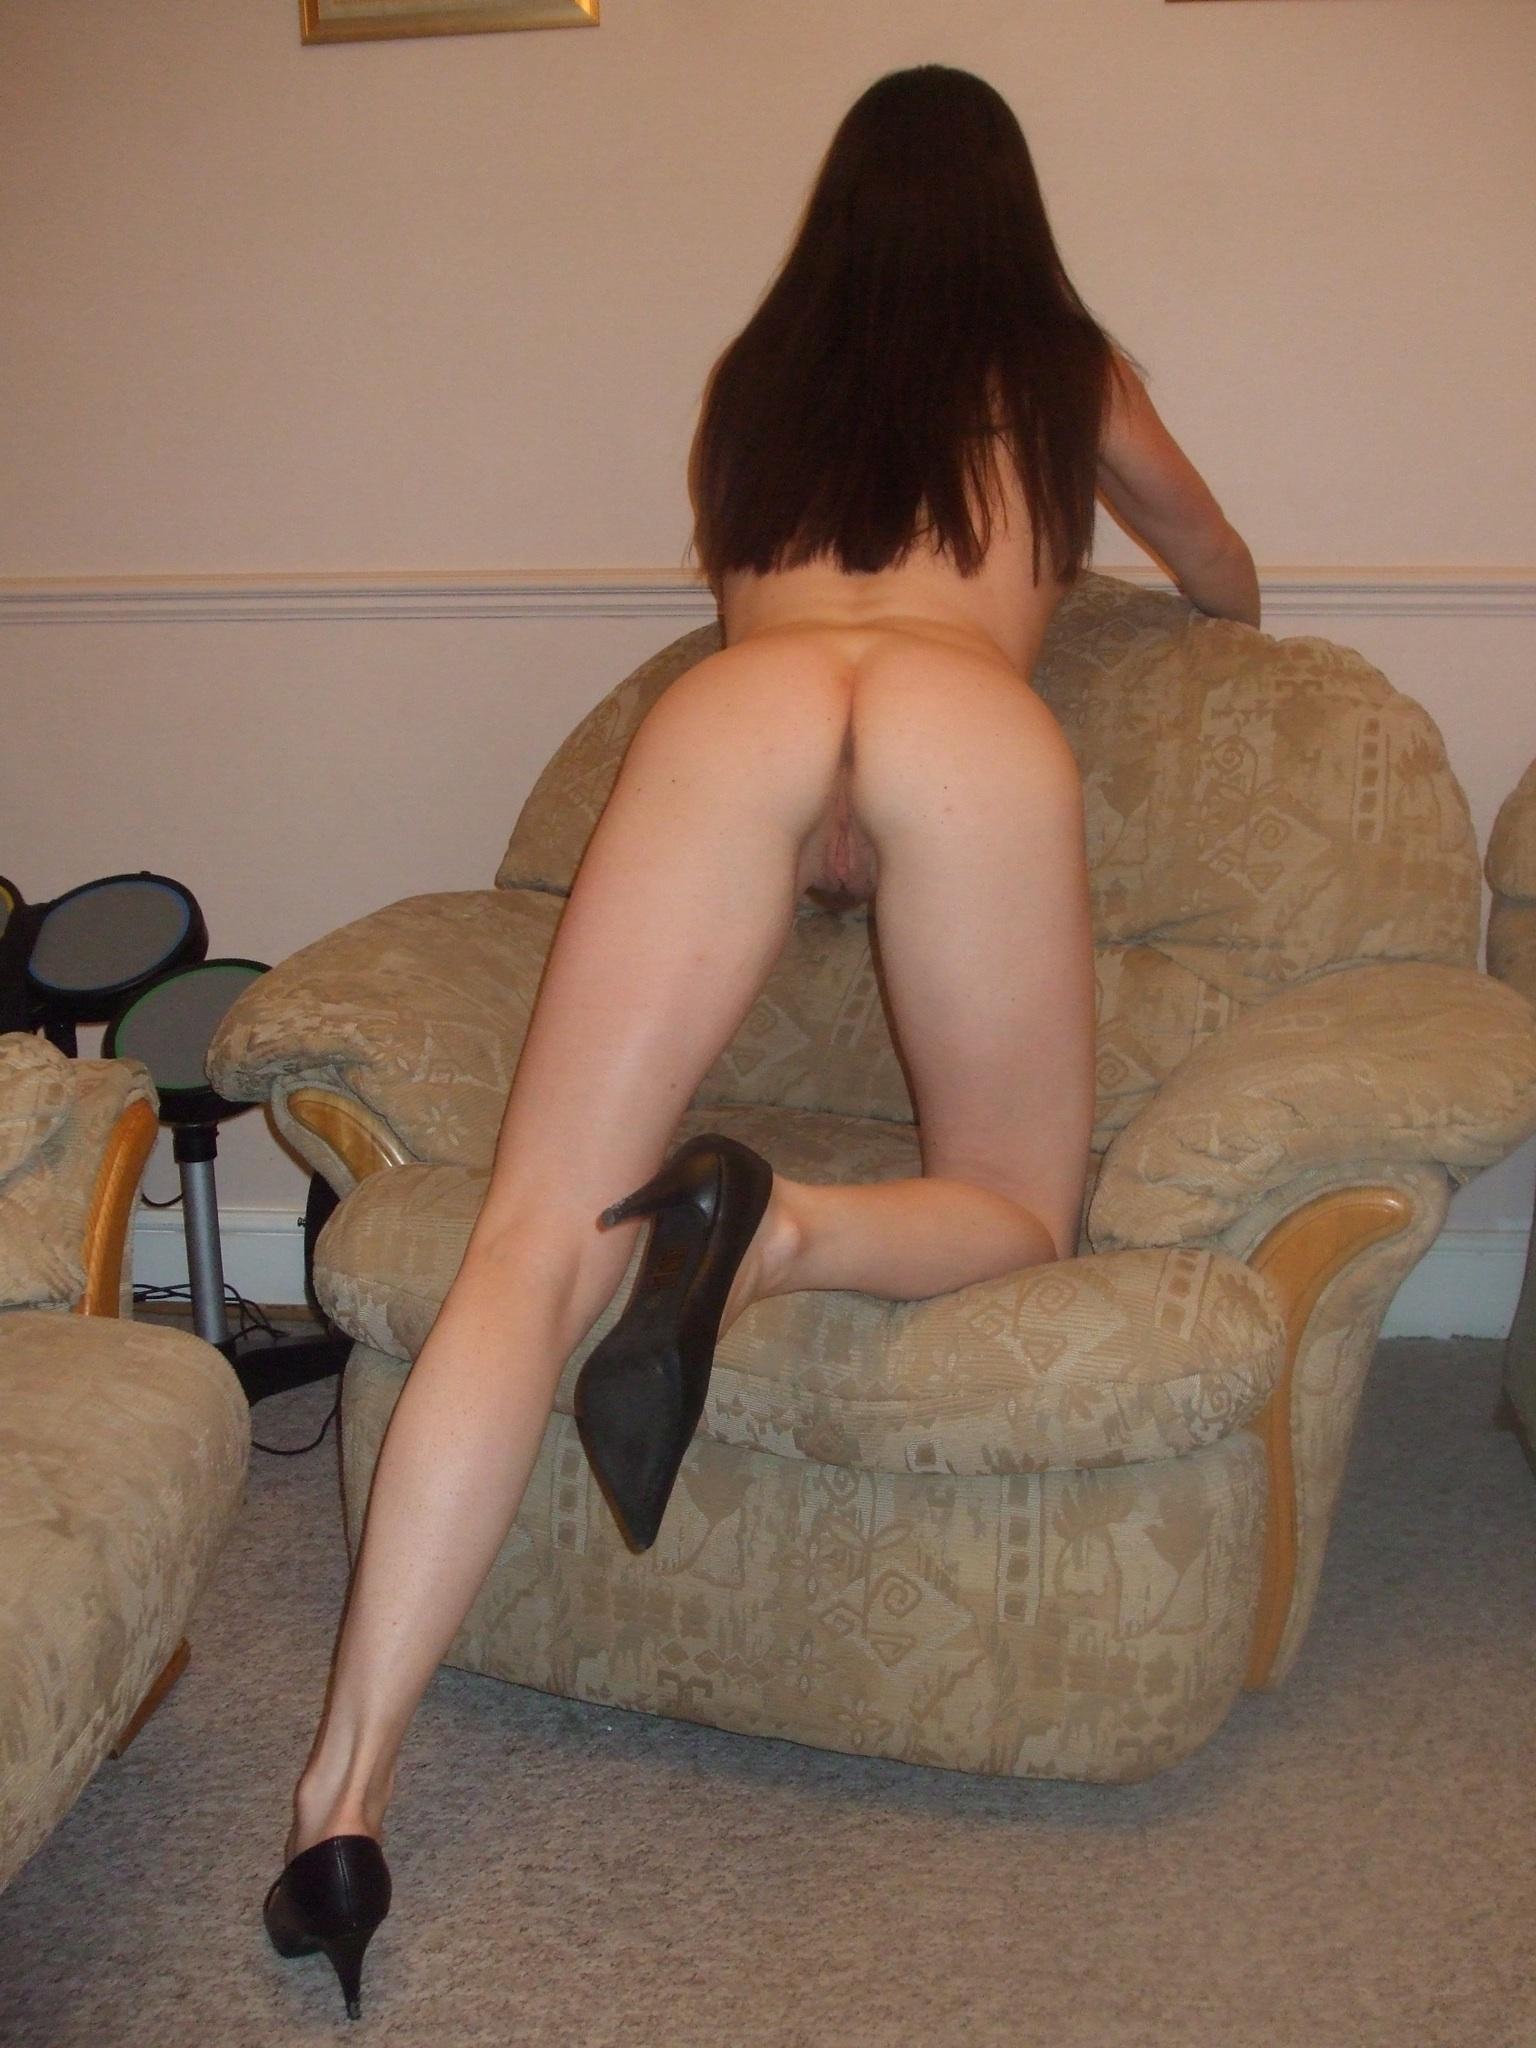 kim engelbrecht nude photos hot leaked naked pics of kim